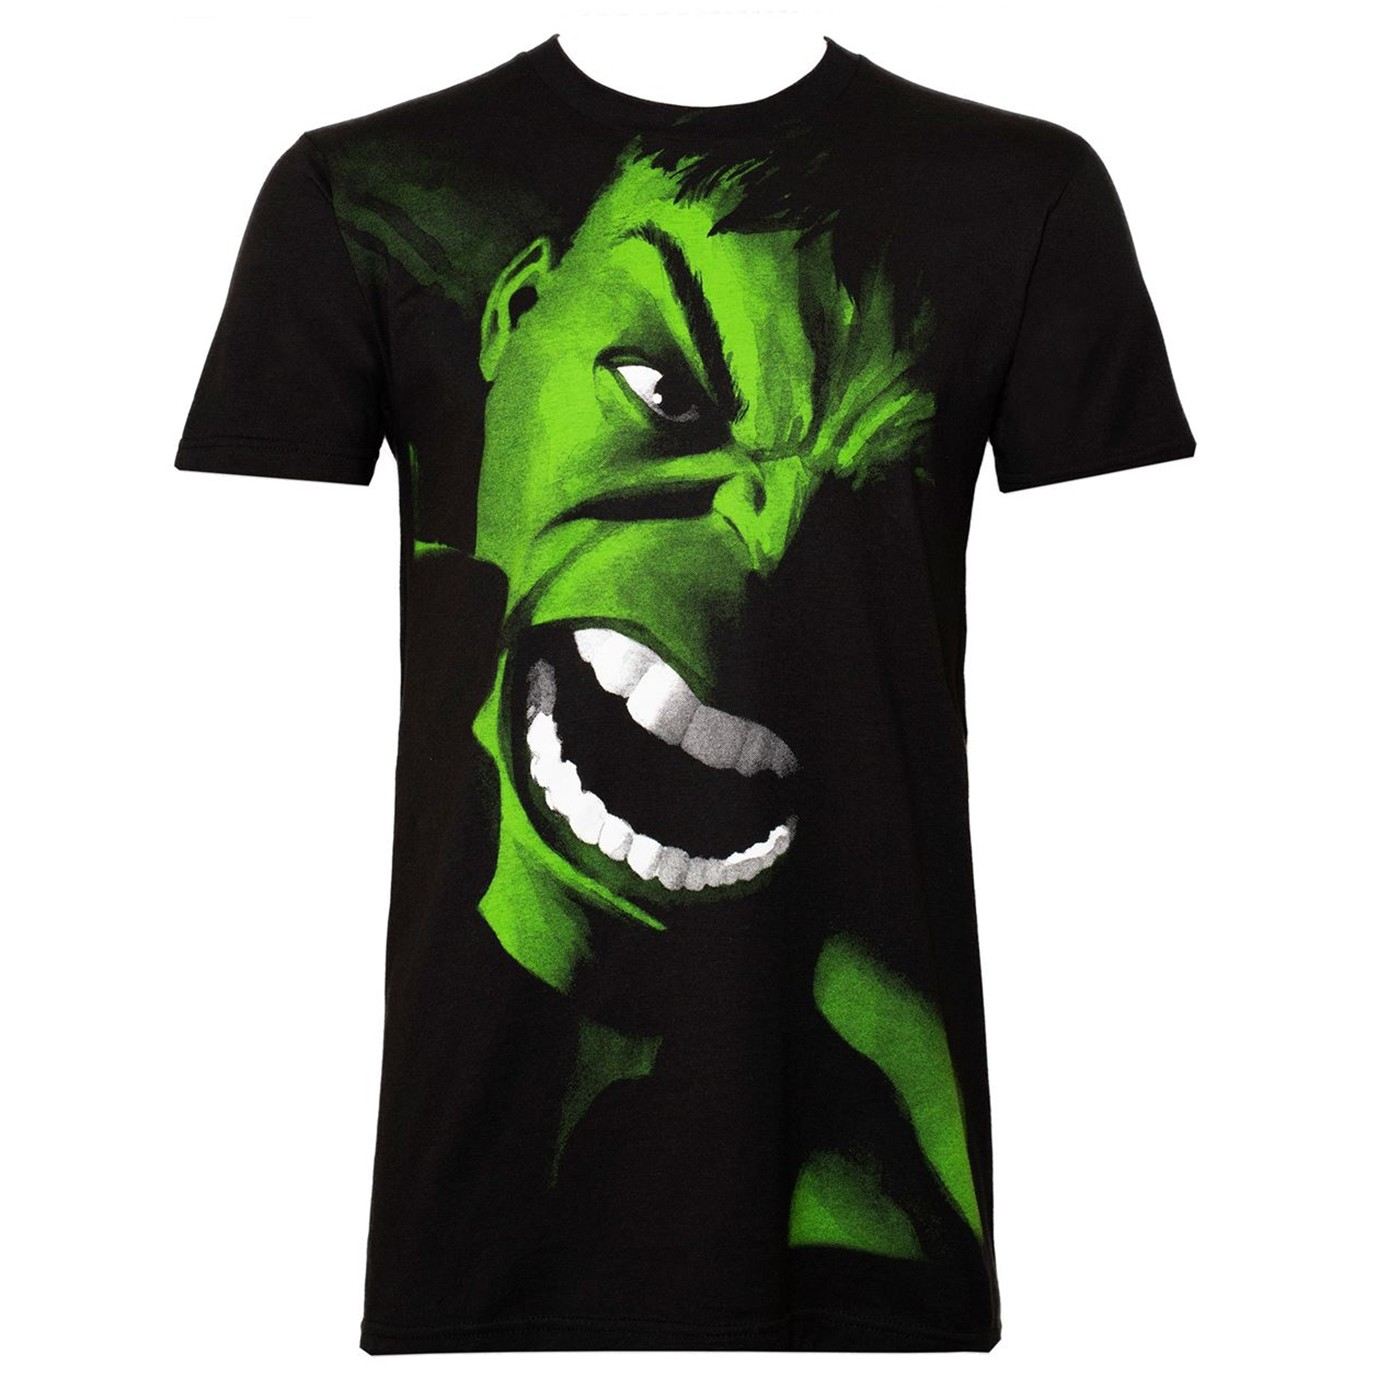 Incredible Hulk Yell Men's Black T-shirt